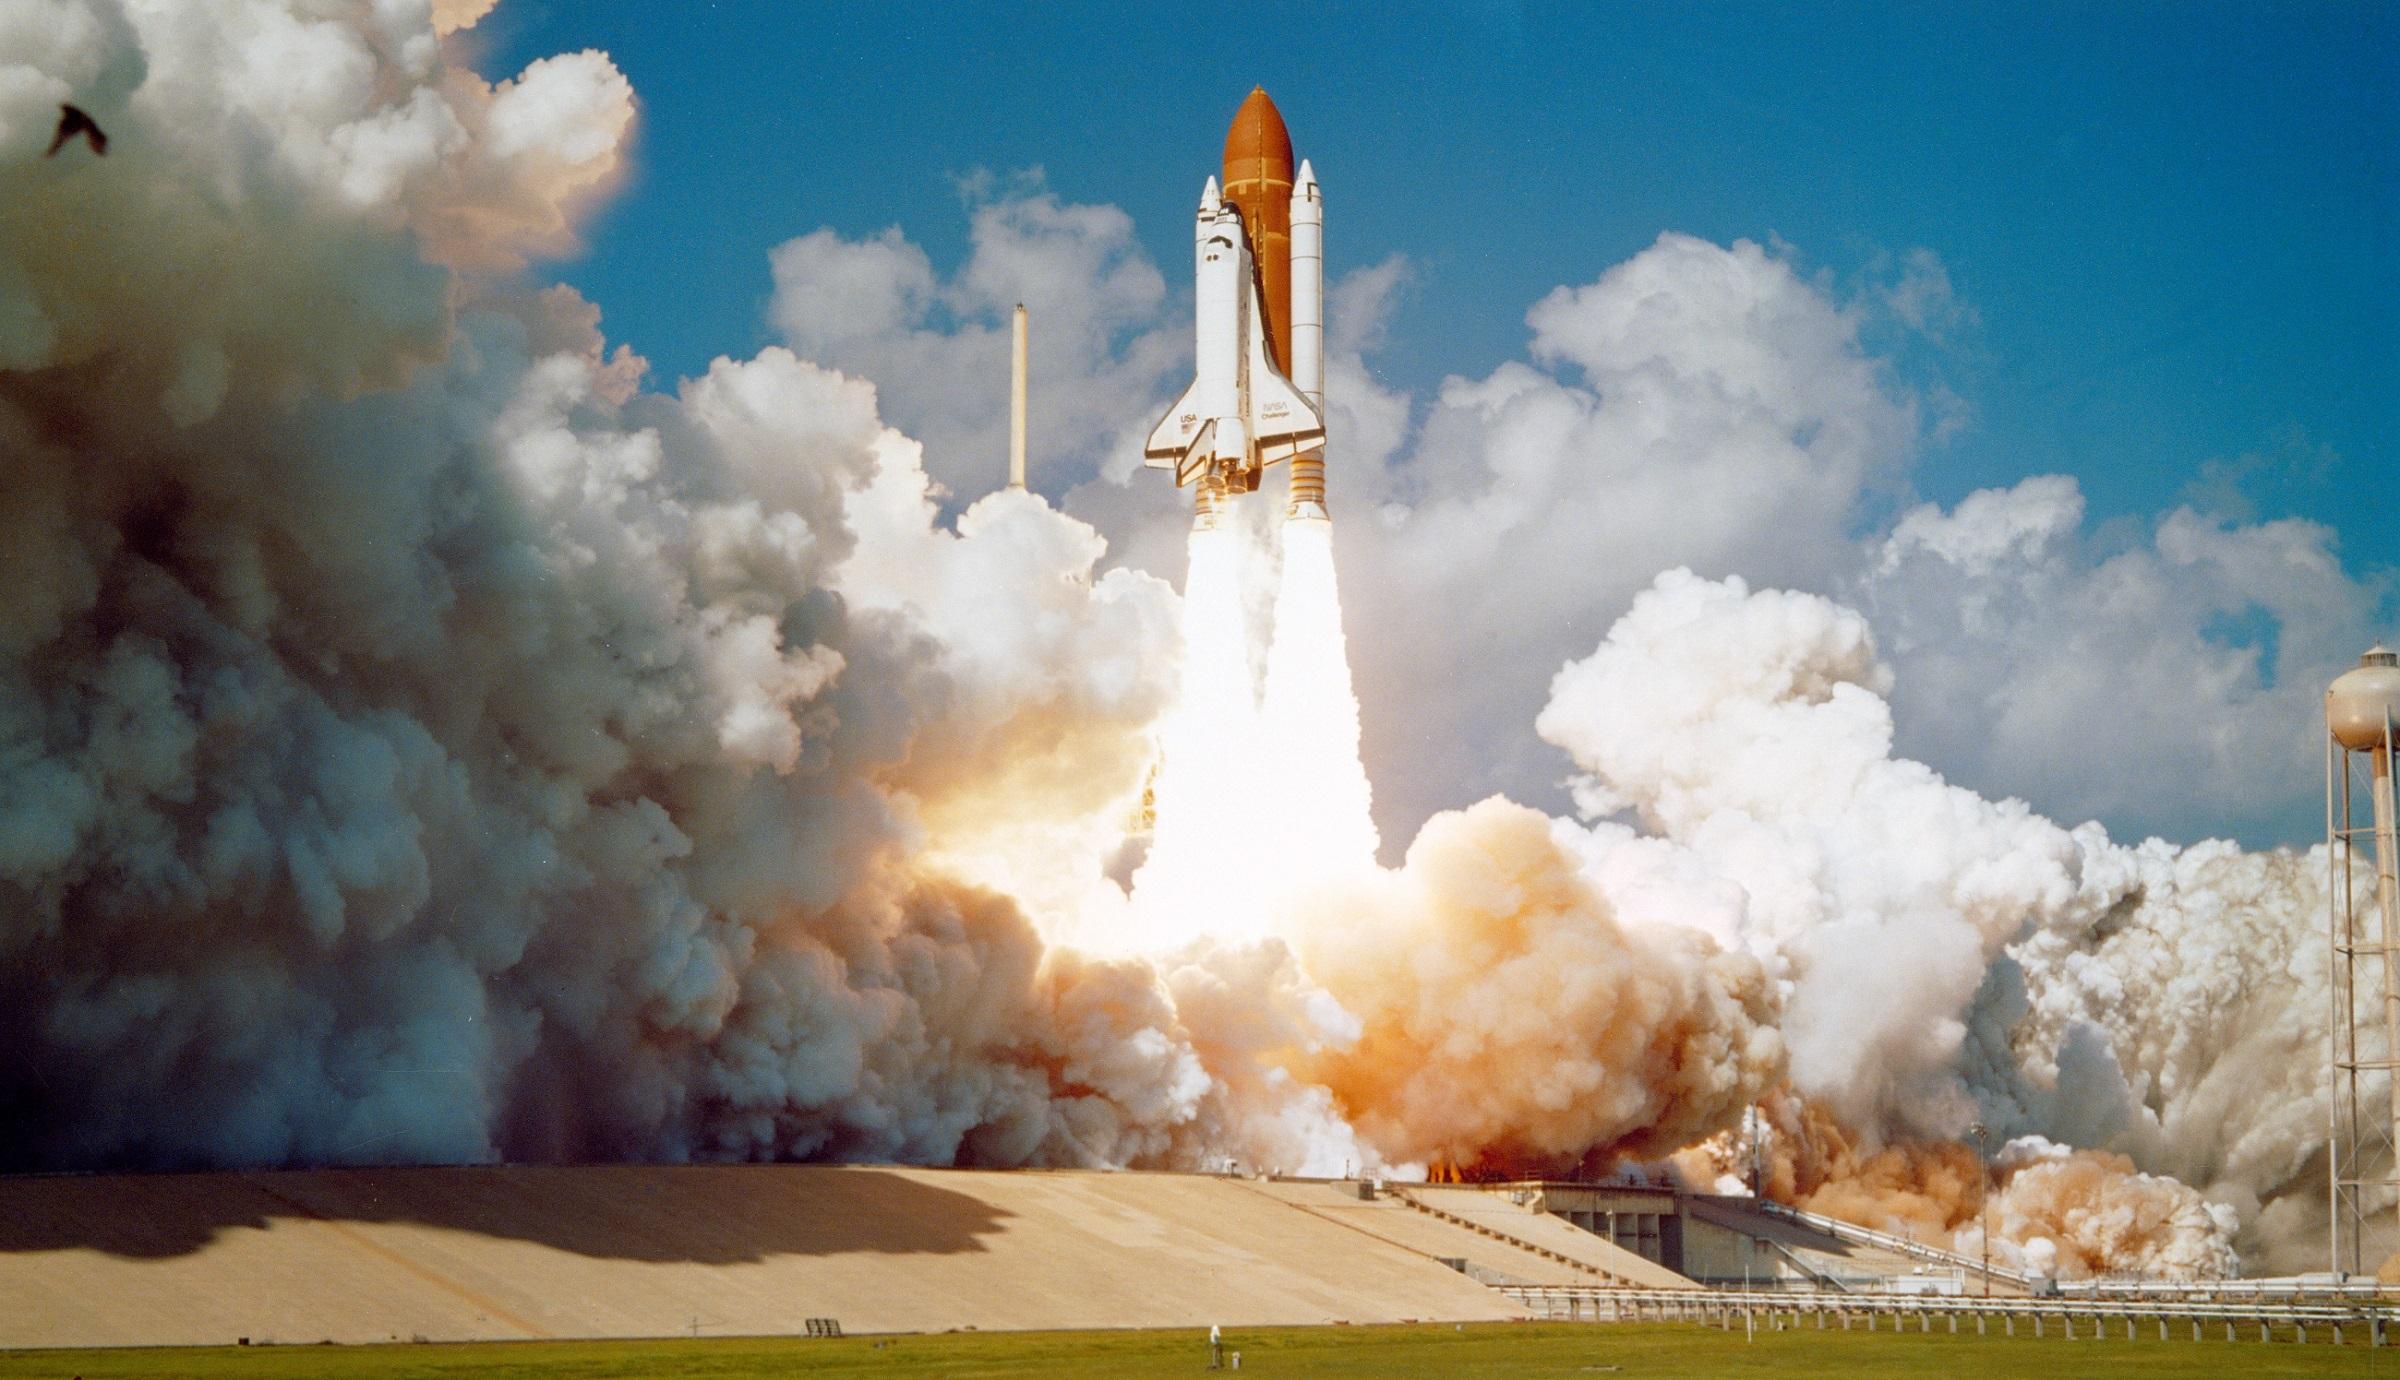 nasa space shuttle landing on earth - photo #46